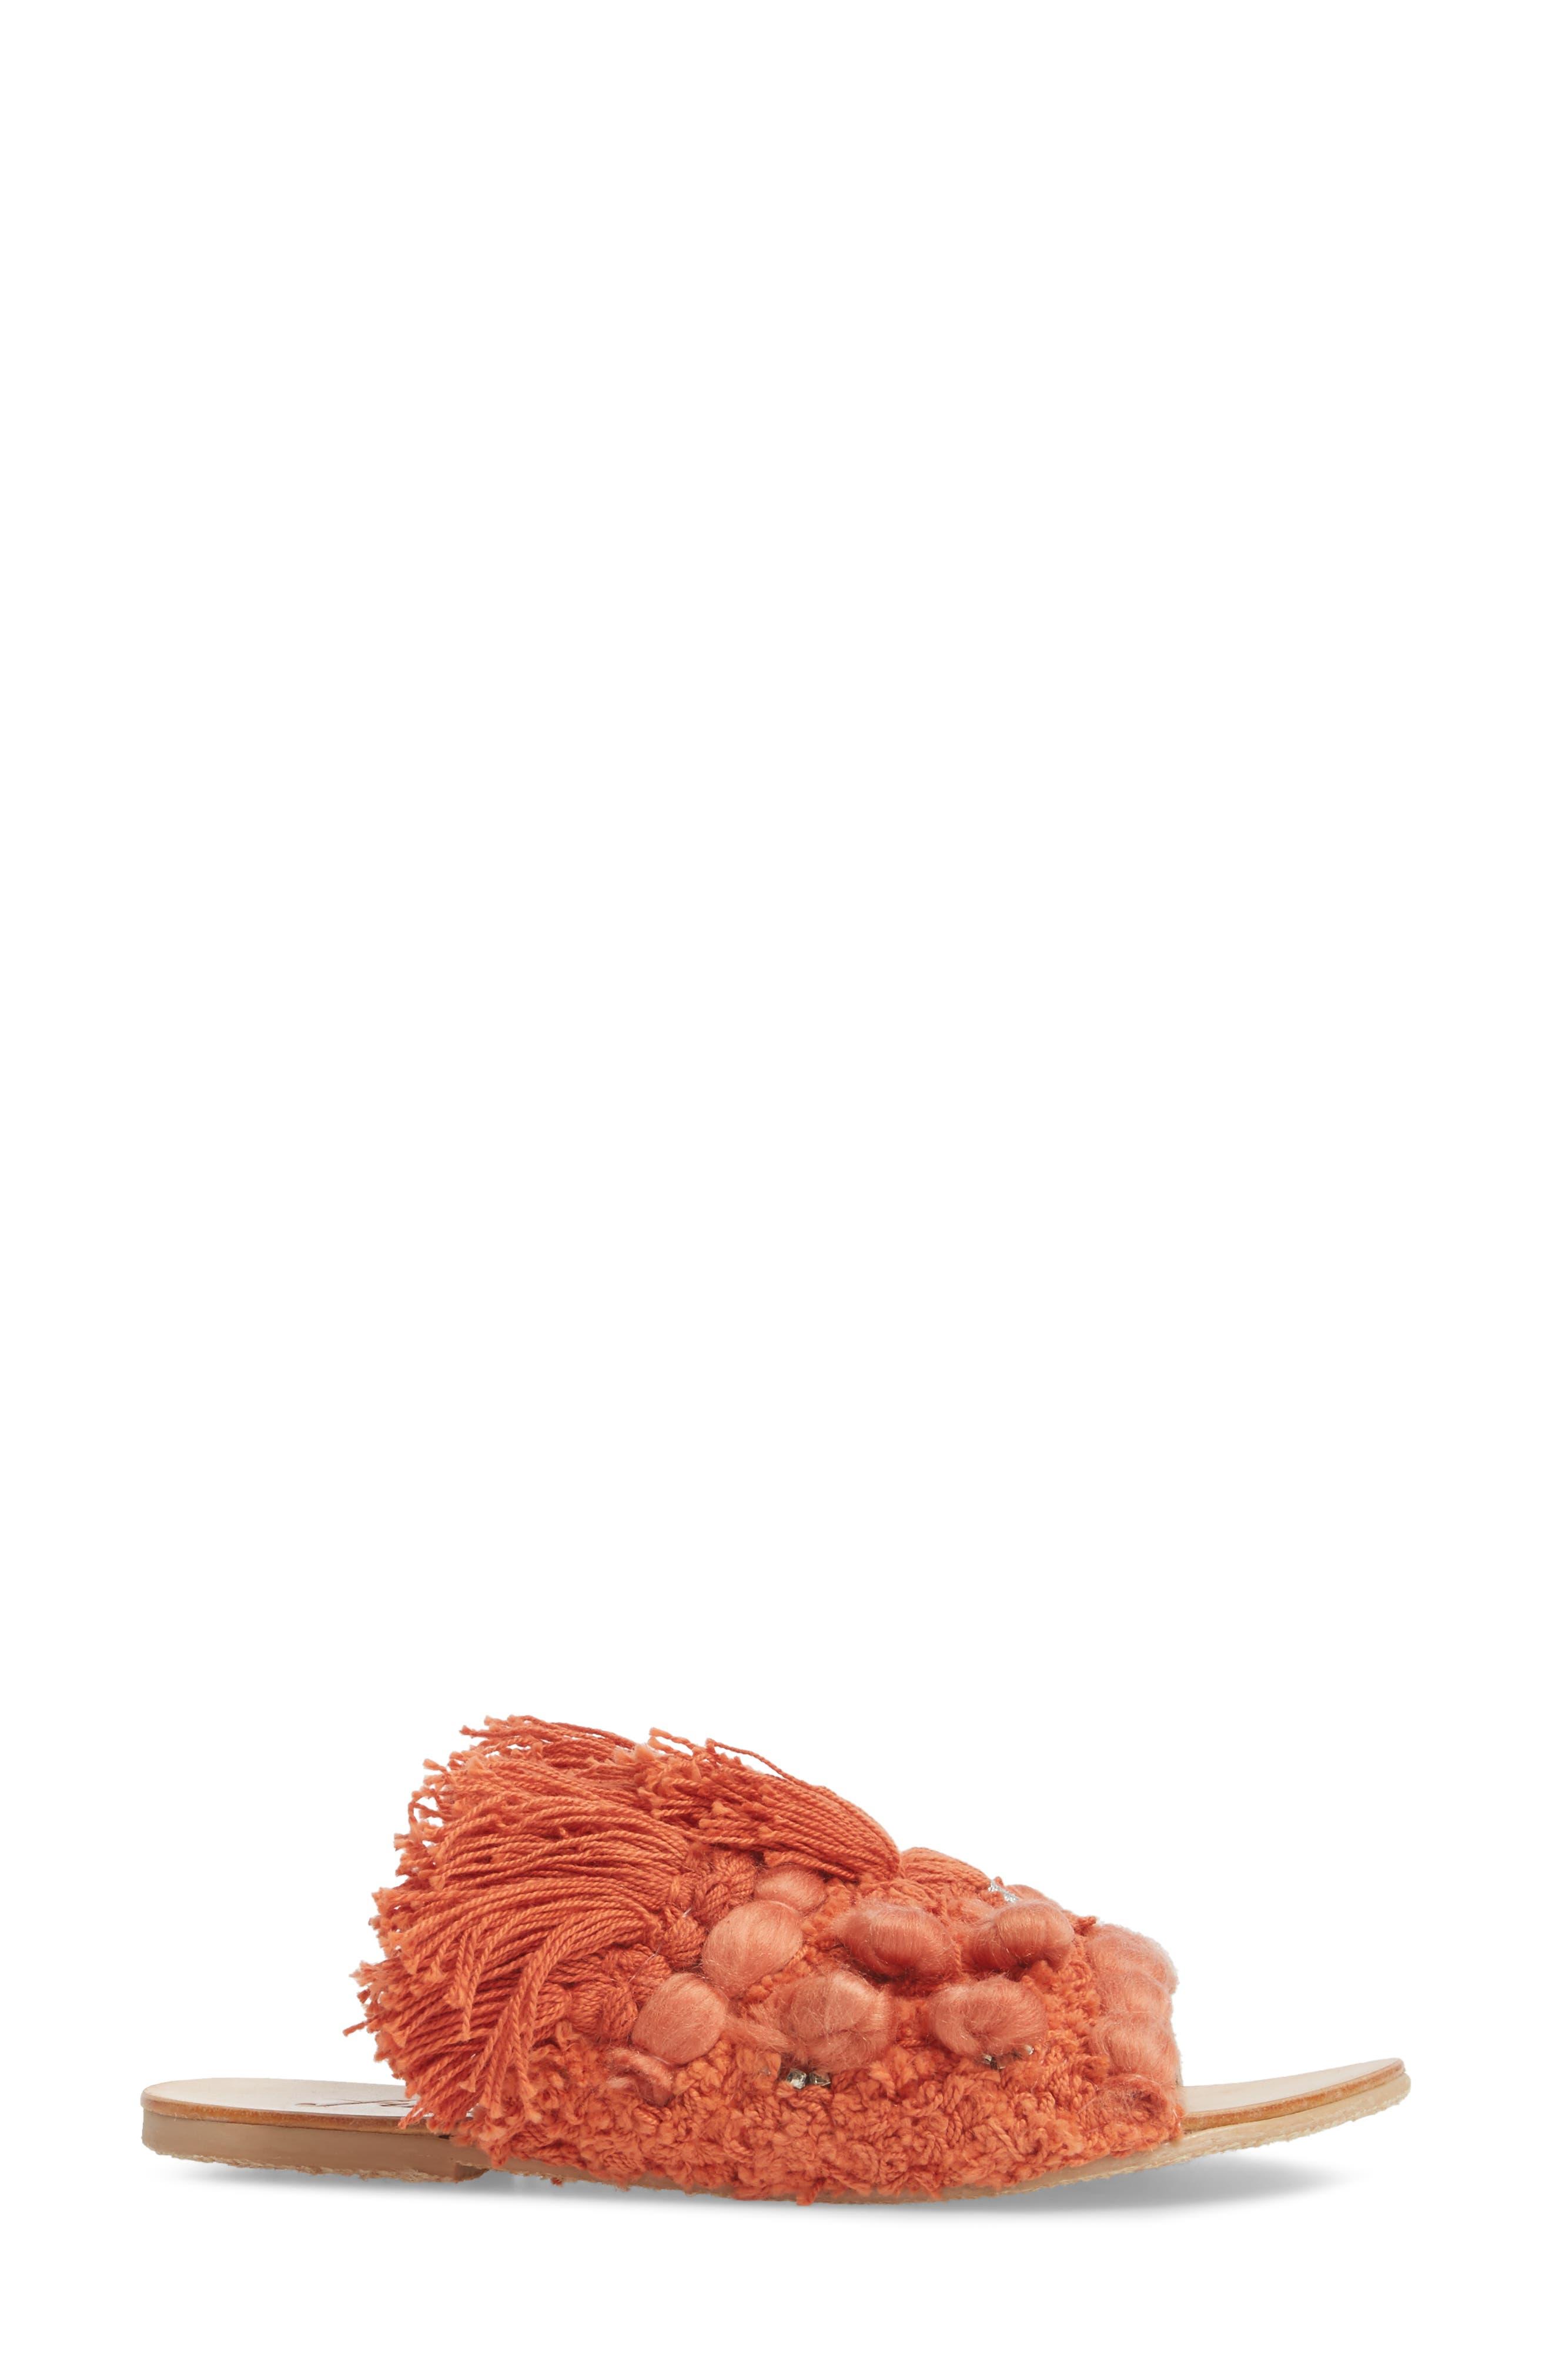 Mars at Night Tasseled Slide Sandal,                             Alternate thumbnail 3, color,                             Coral